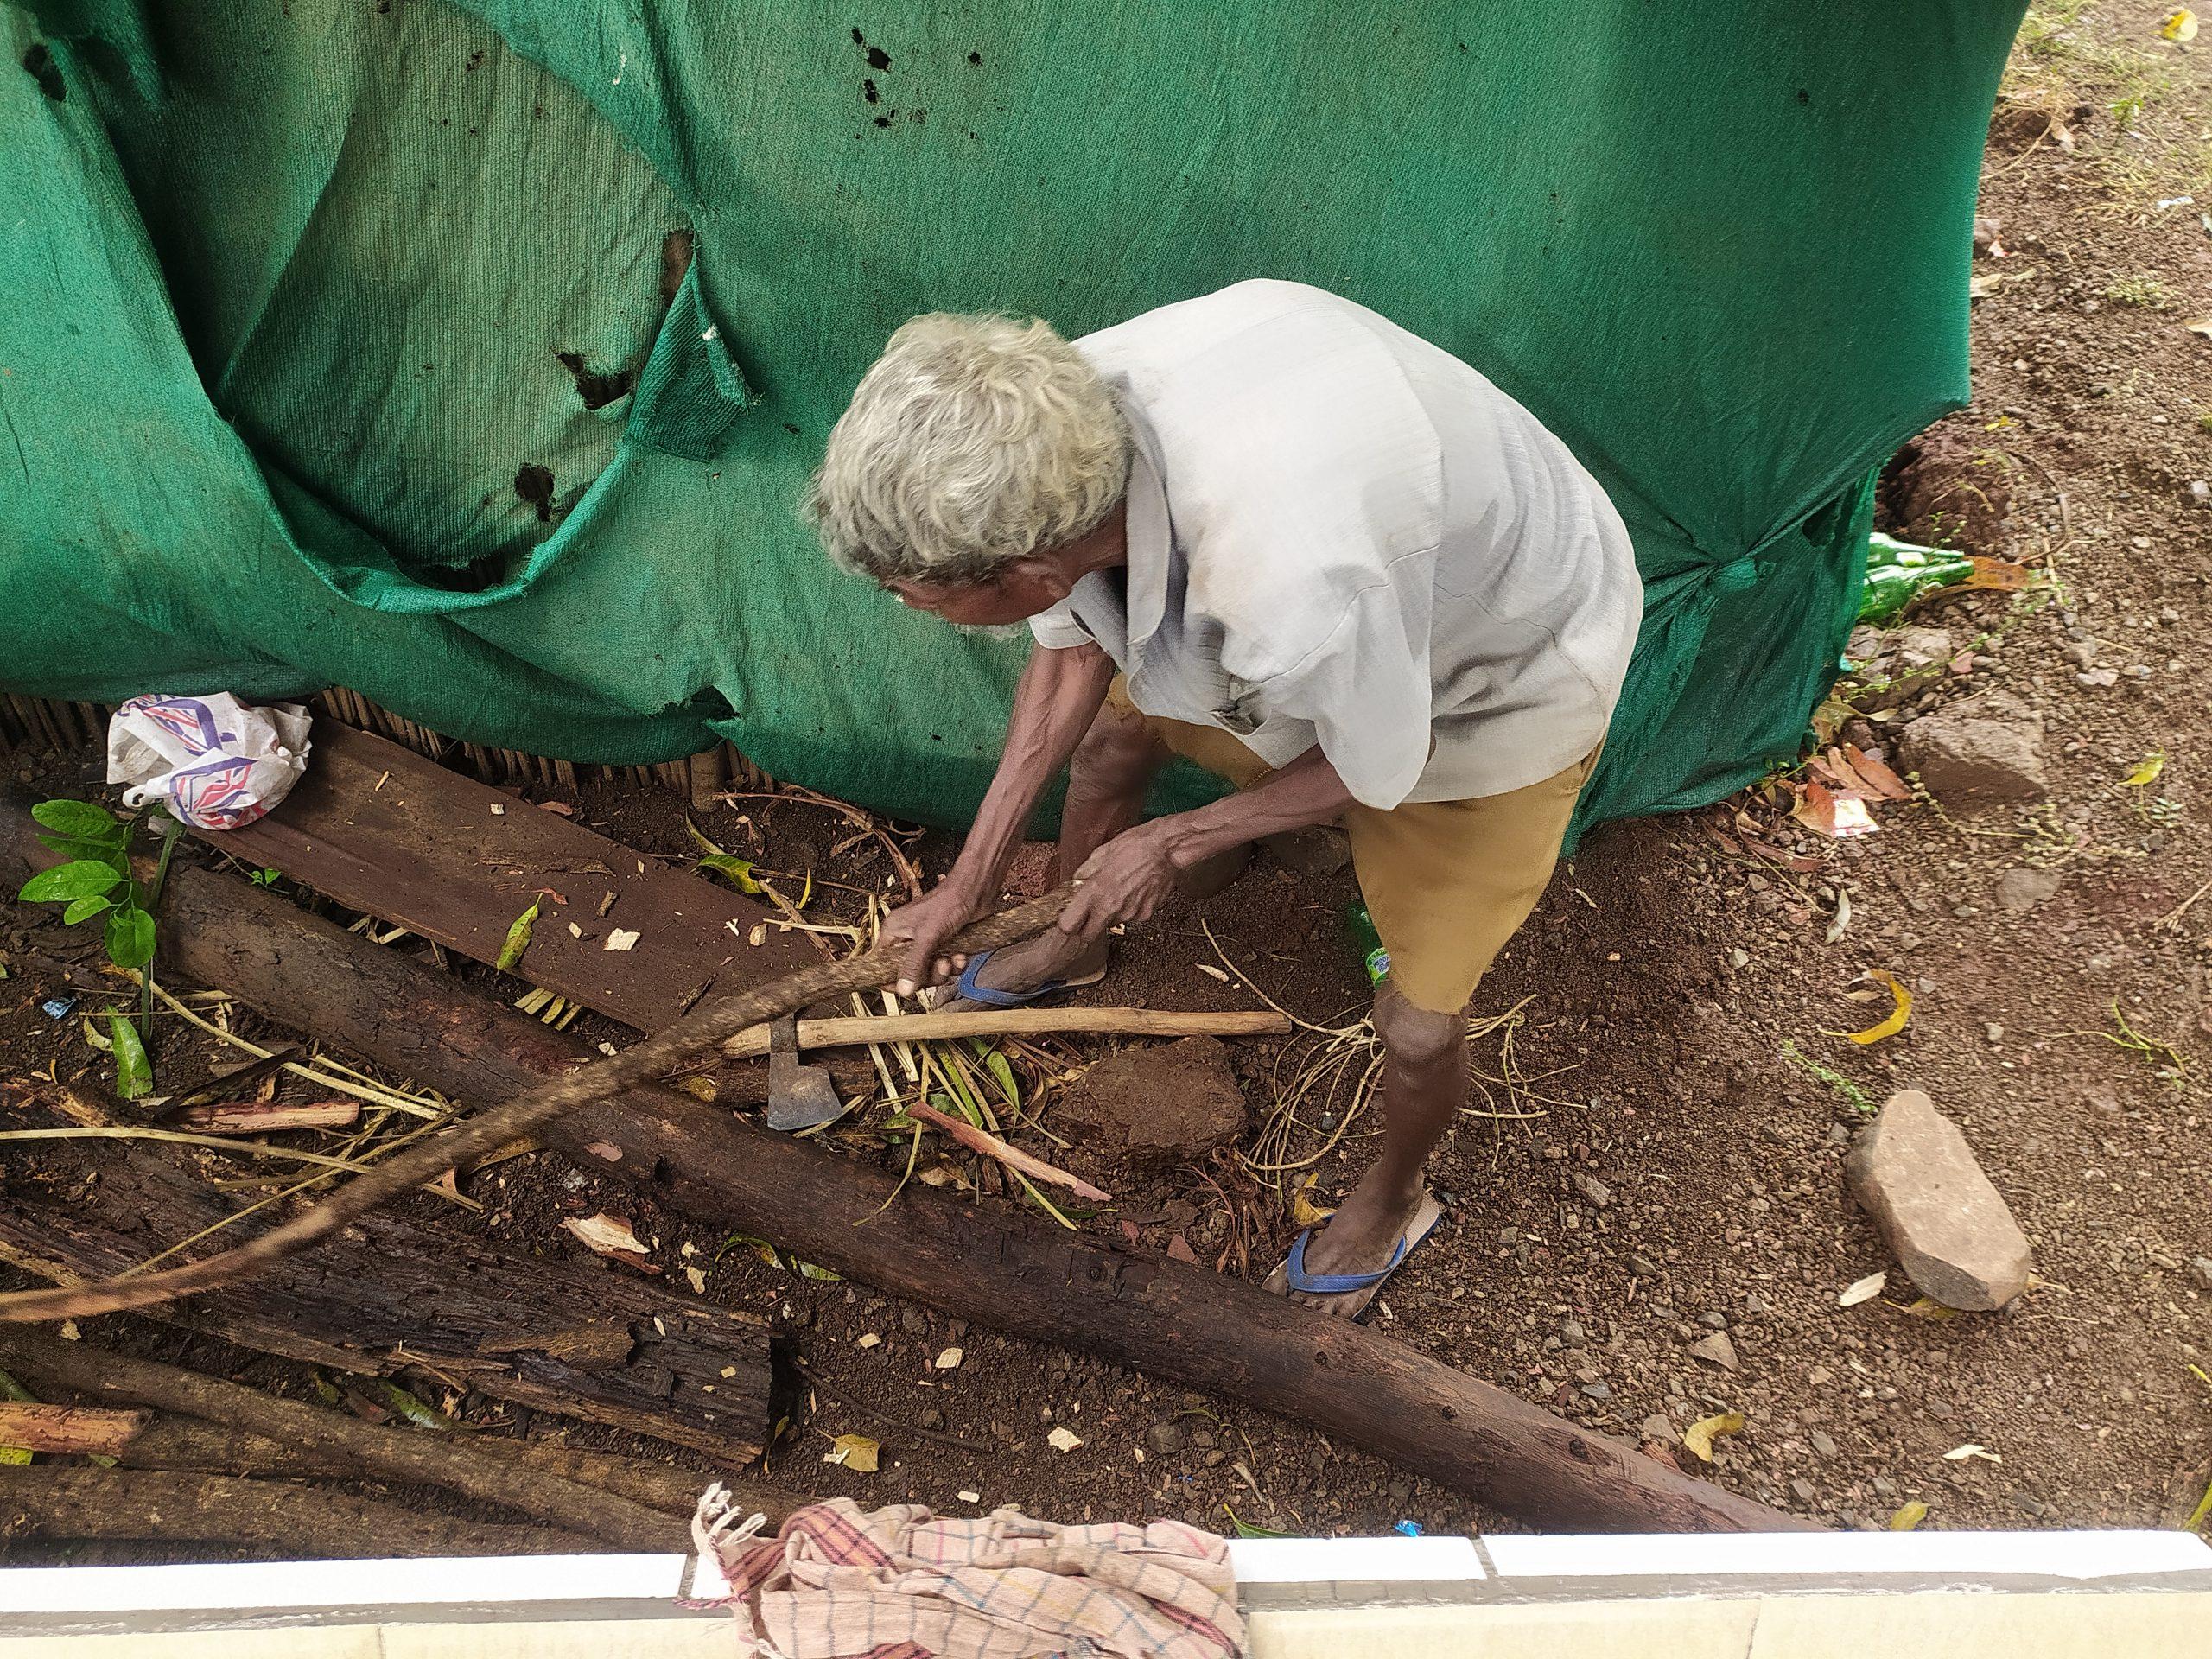 A man cutting woods